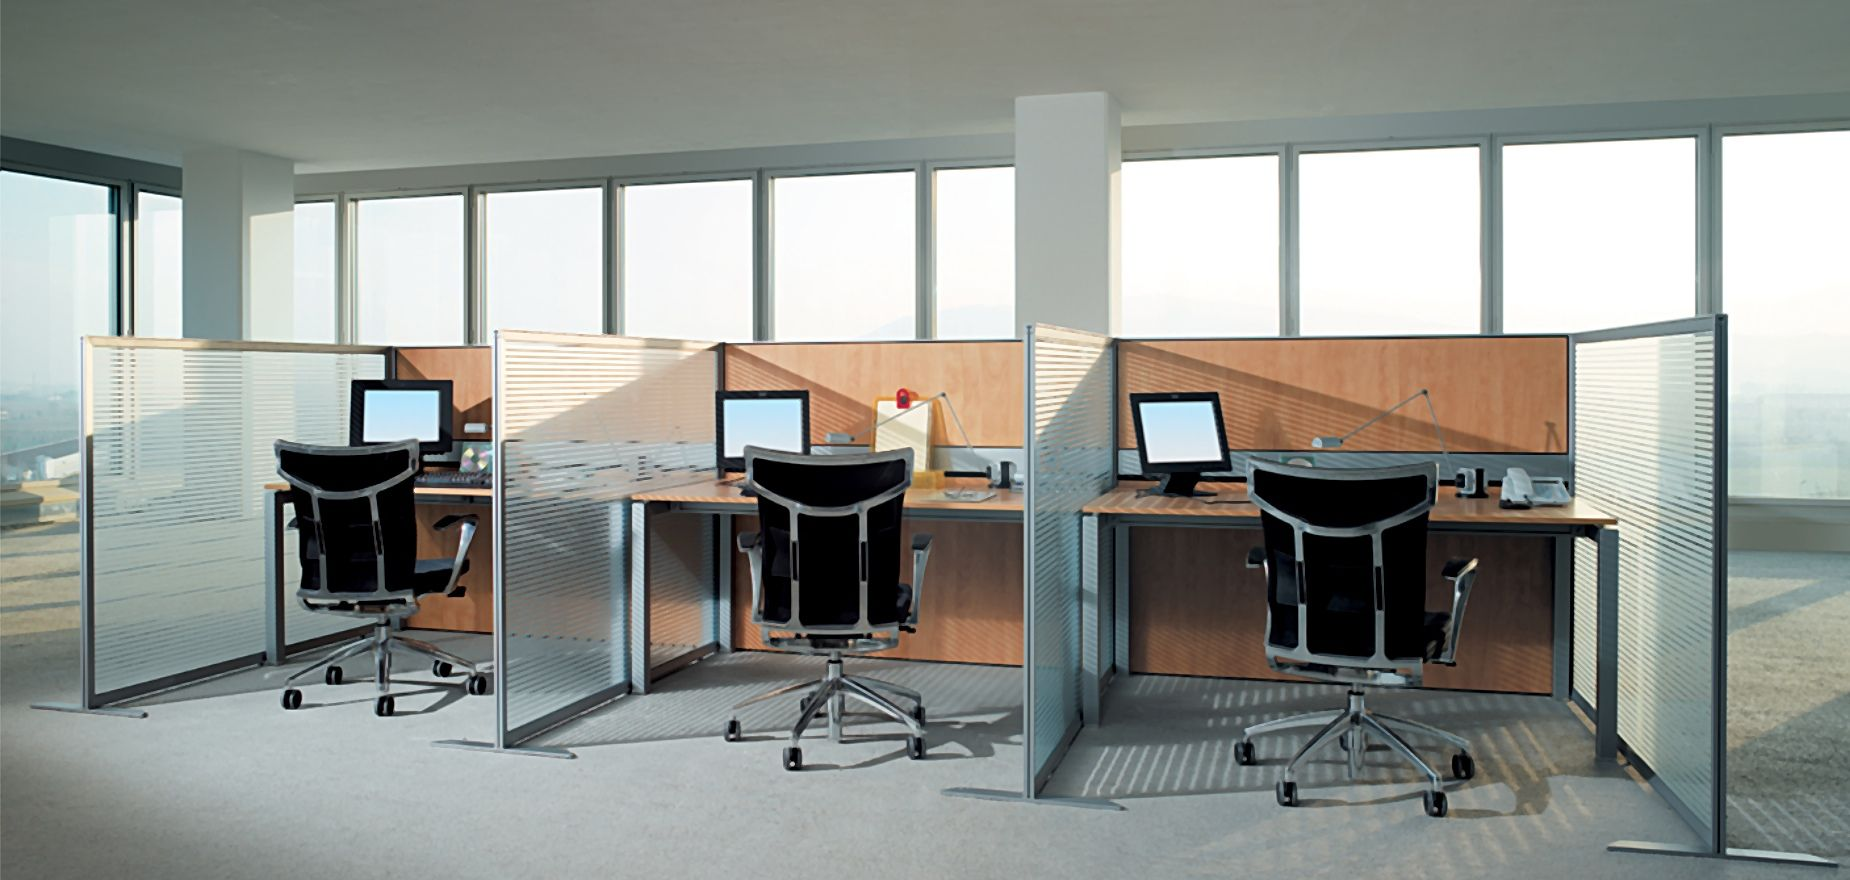 Cubiculos para oficina buscar con google sala de for Oficinas interiores